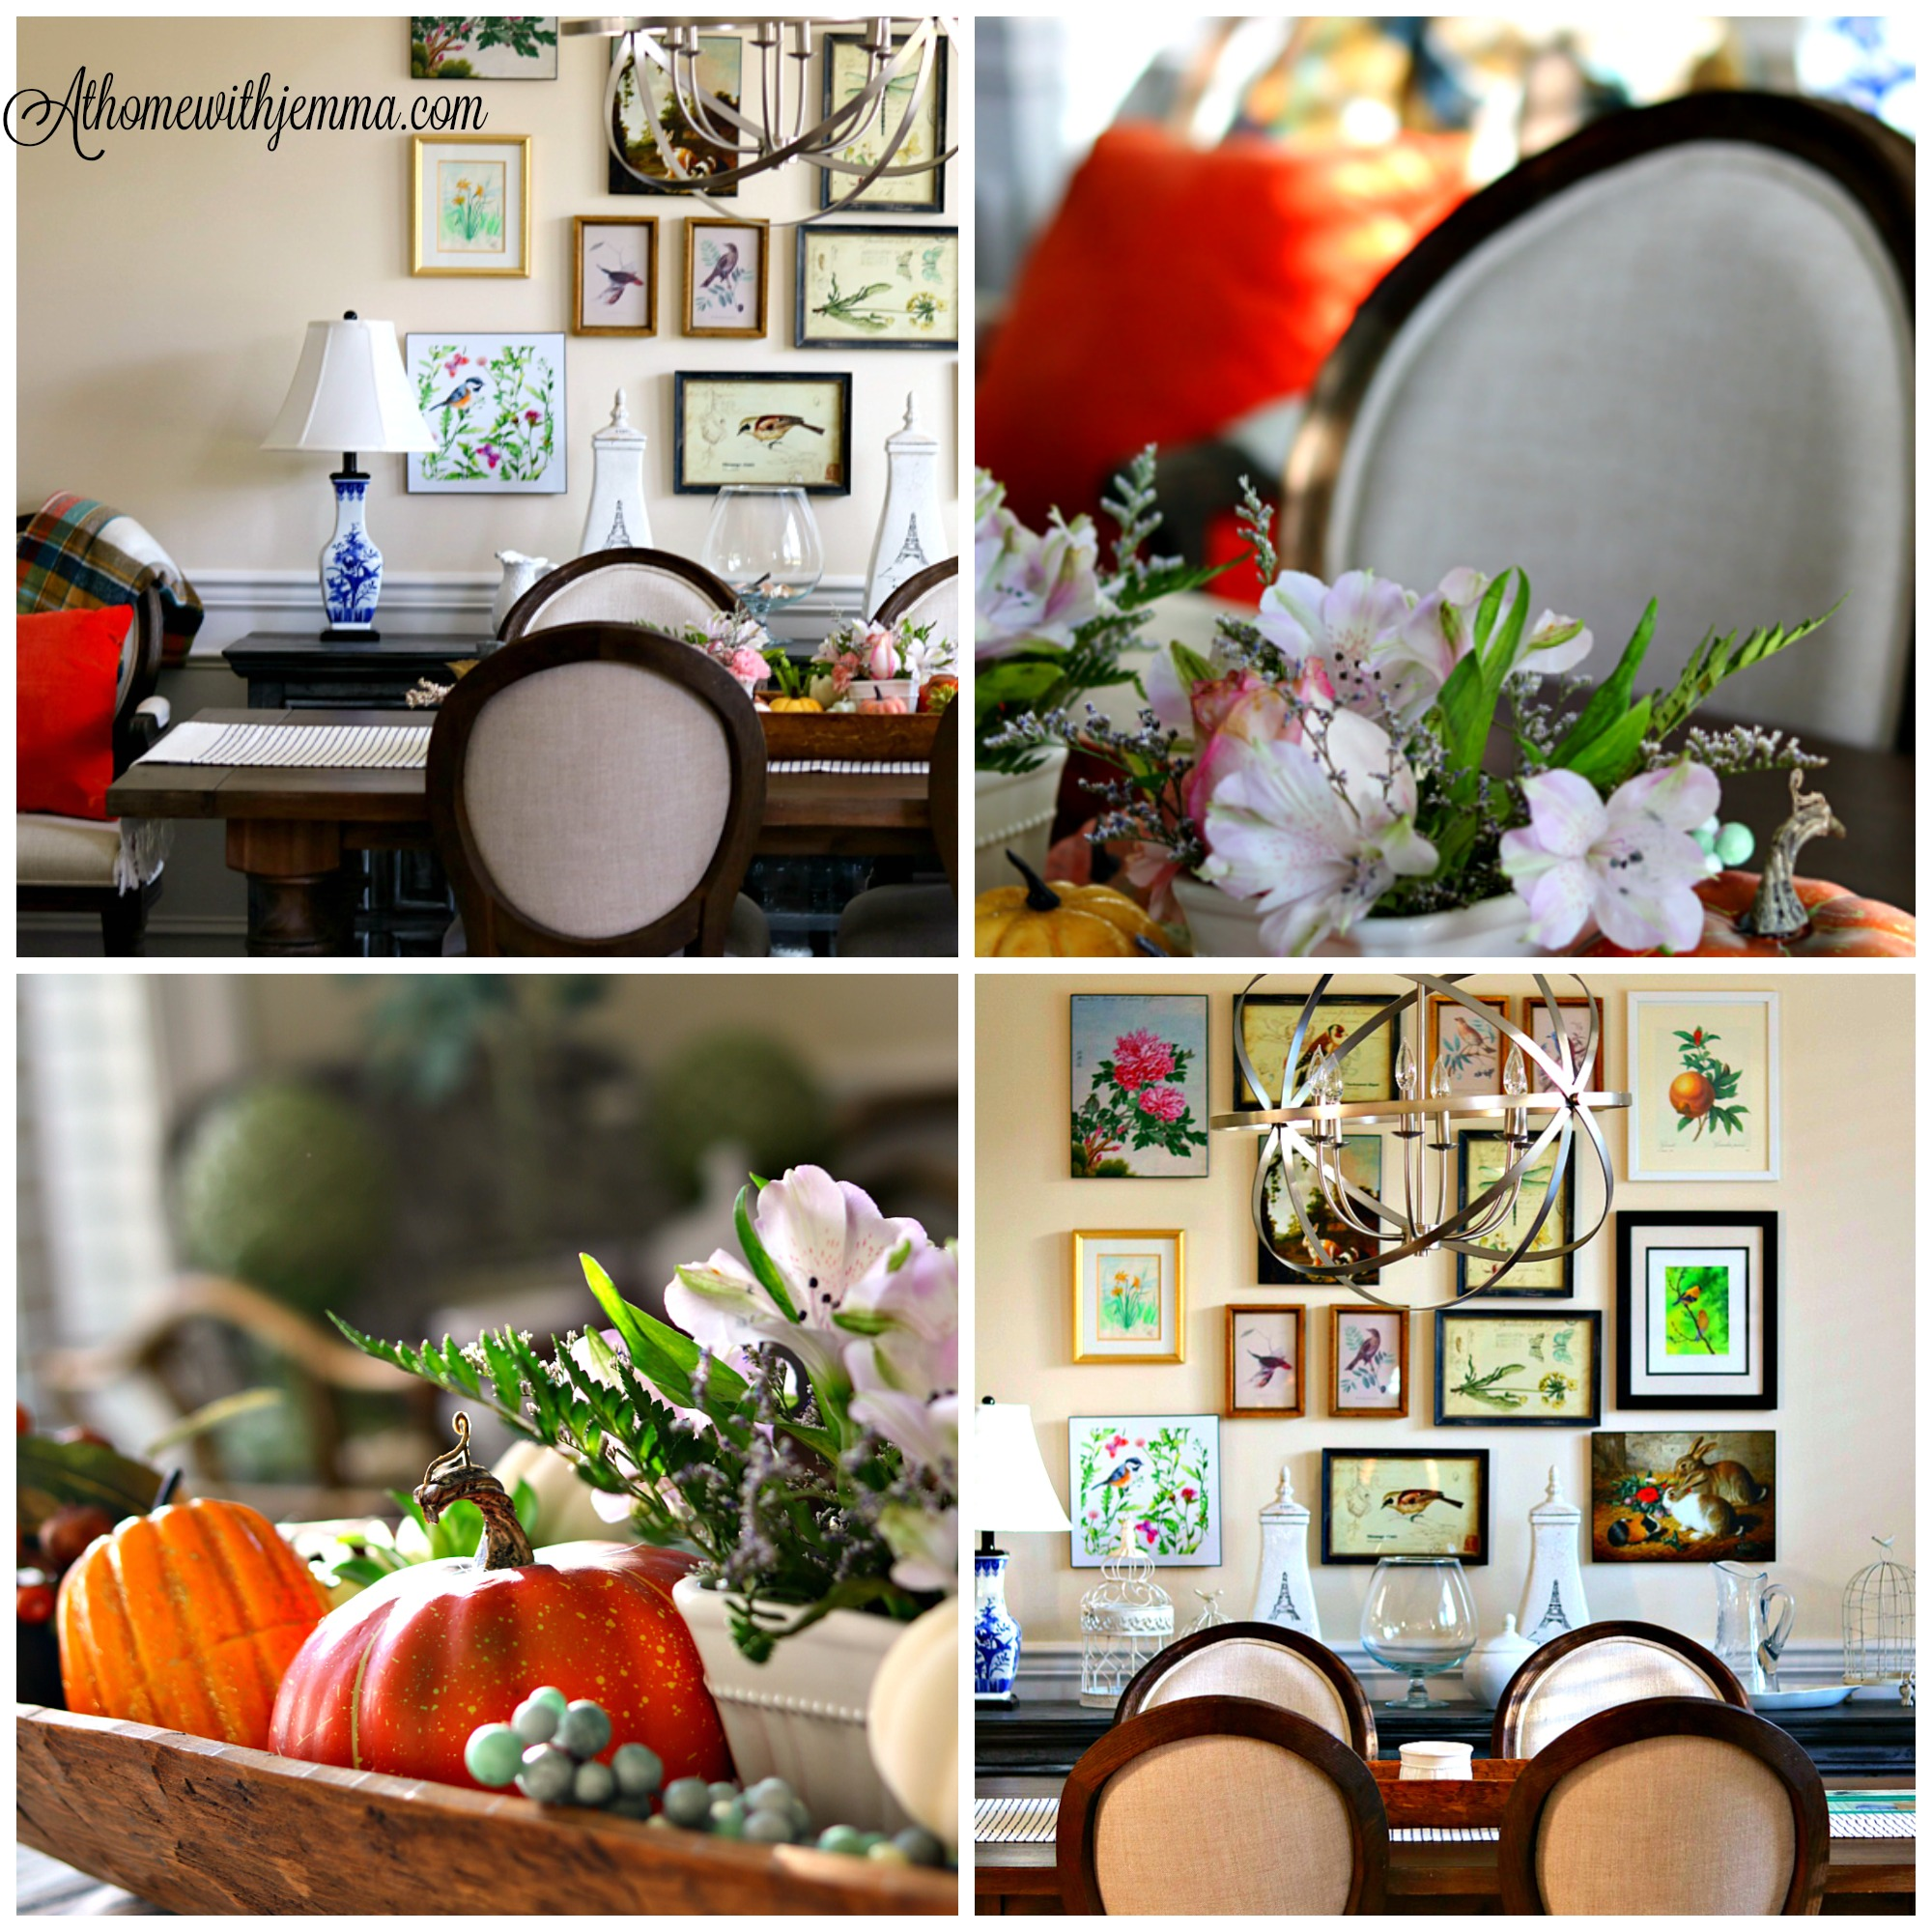 centerpiece, dough, bowl, decor, styling, pumpkins, french, farmhouse, athomewithjemma.com